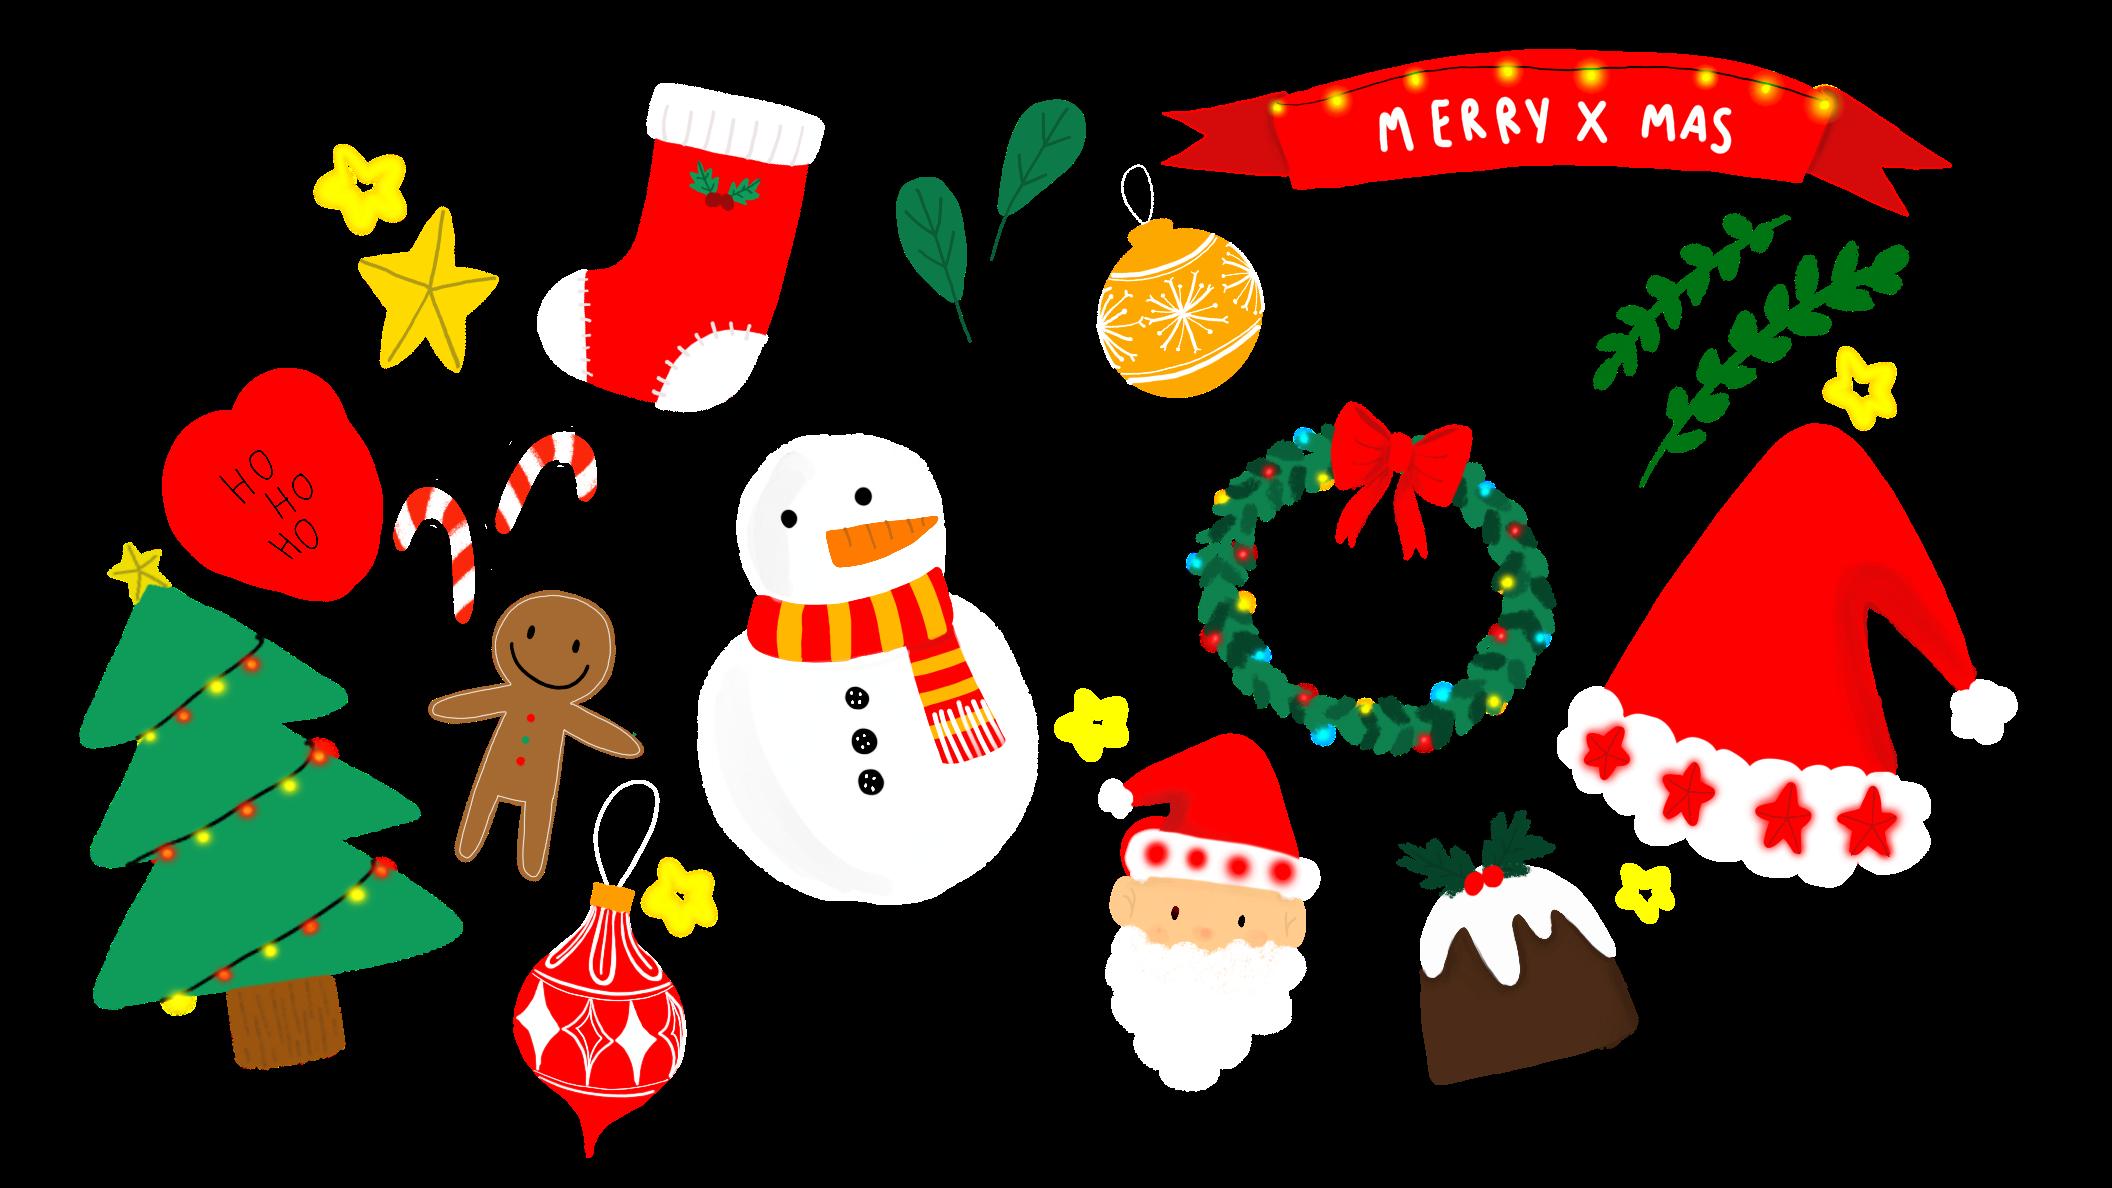 Merry x mas cutest stickers